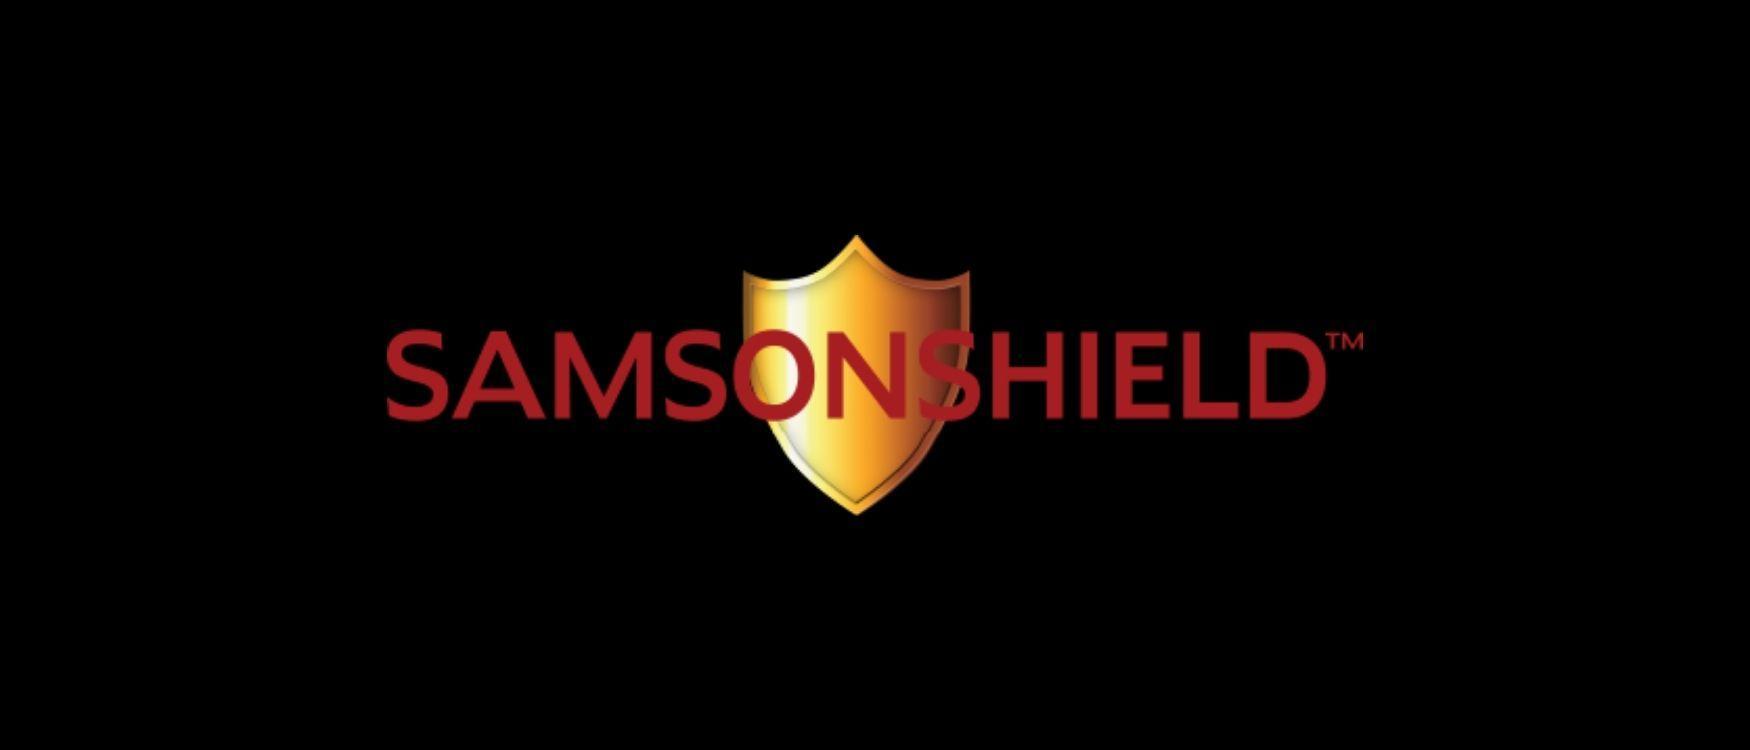 Samsonshield